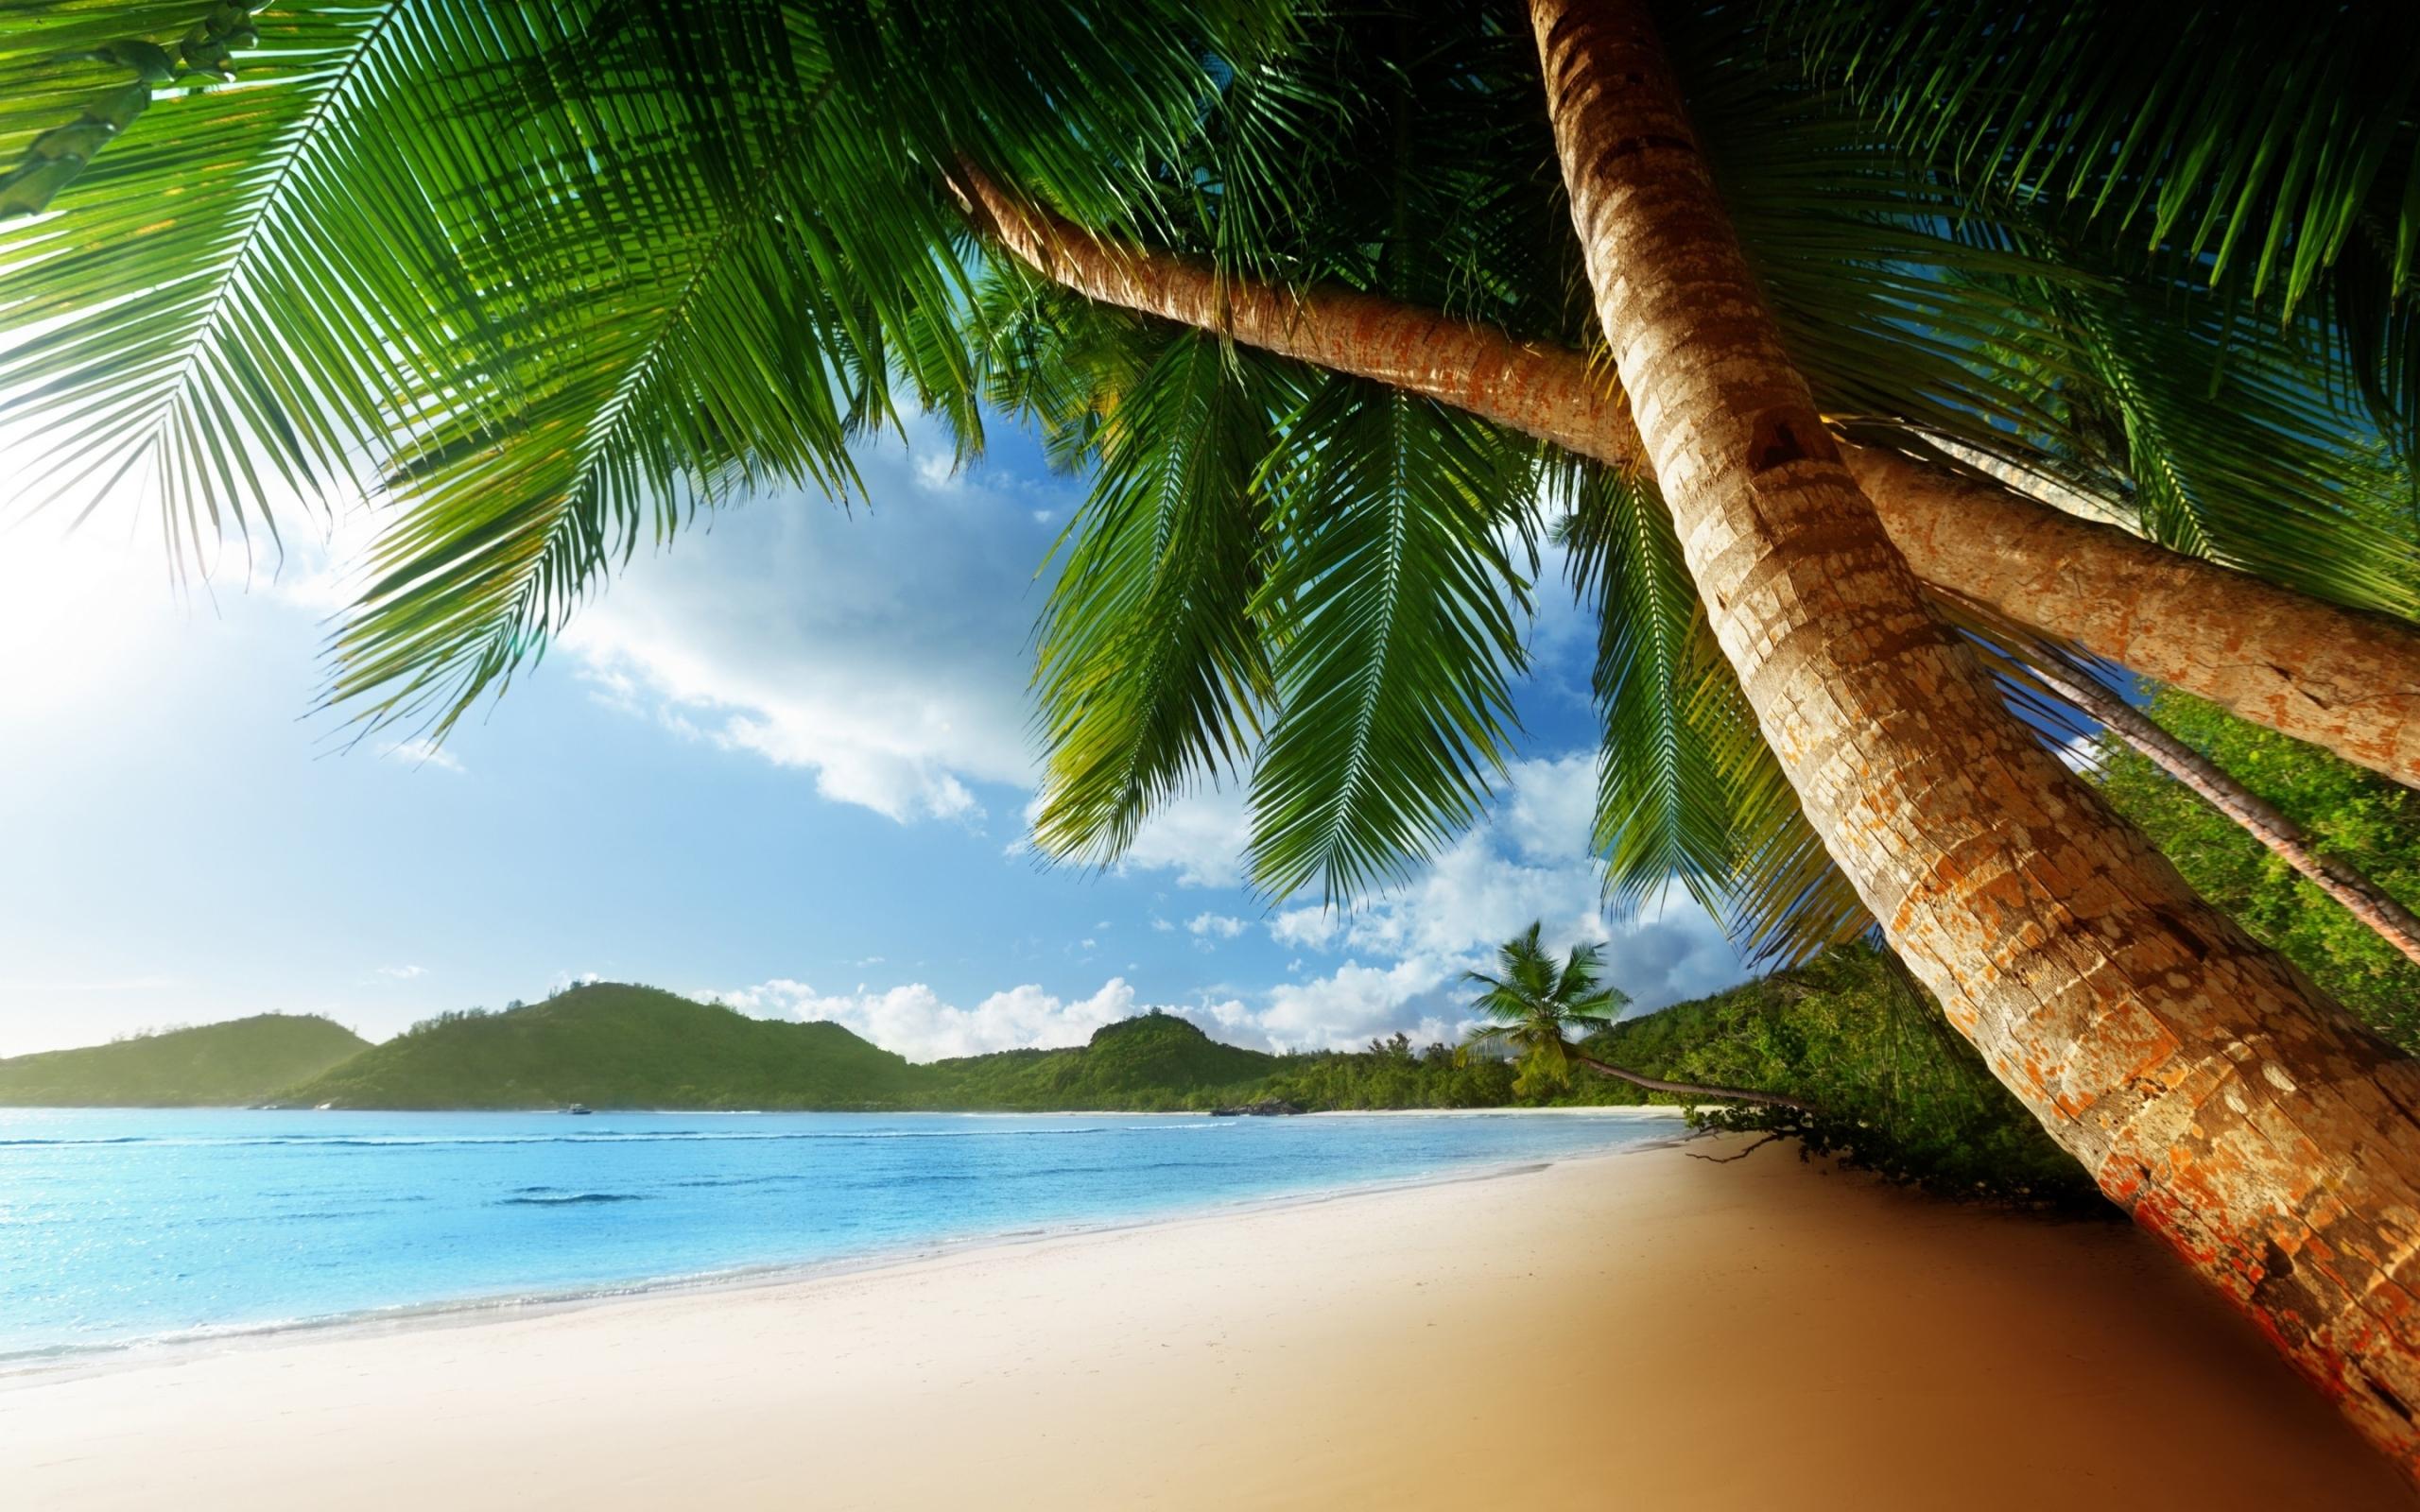 Exotic Island Beach Palm Trees Ocean widescreen wallpaper 2560x1600